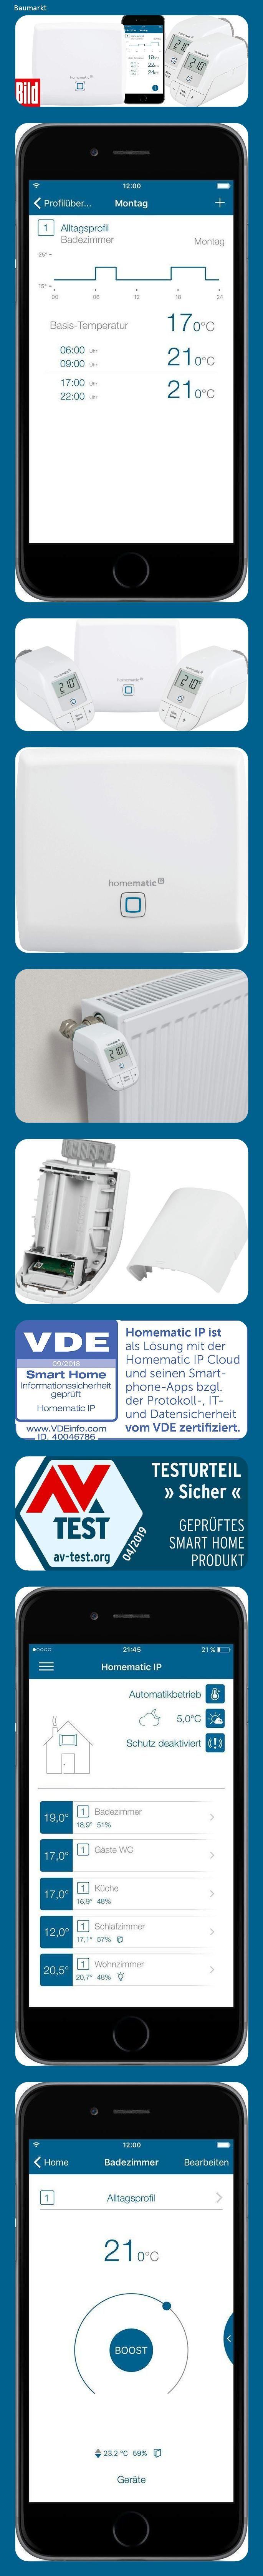 Homematic Ip Smart Home Set Heizen Bild Edition 154589a0 Bilder Sets Edition